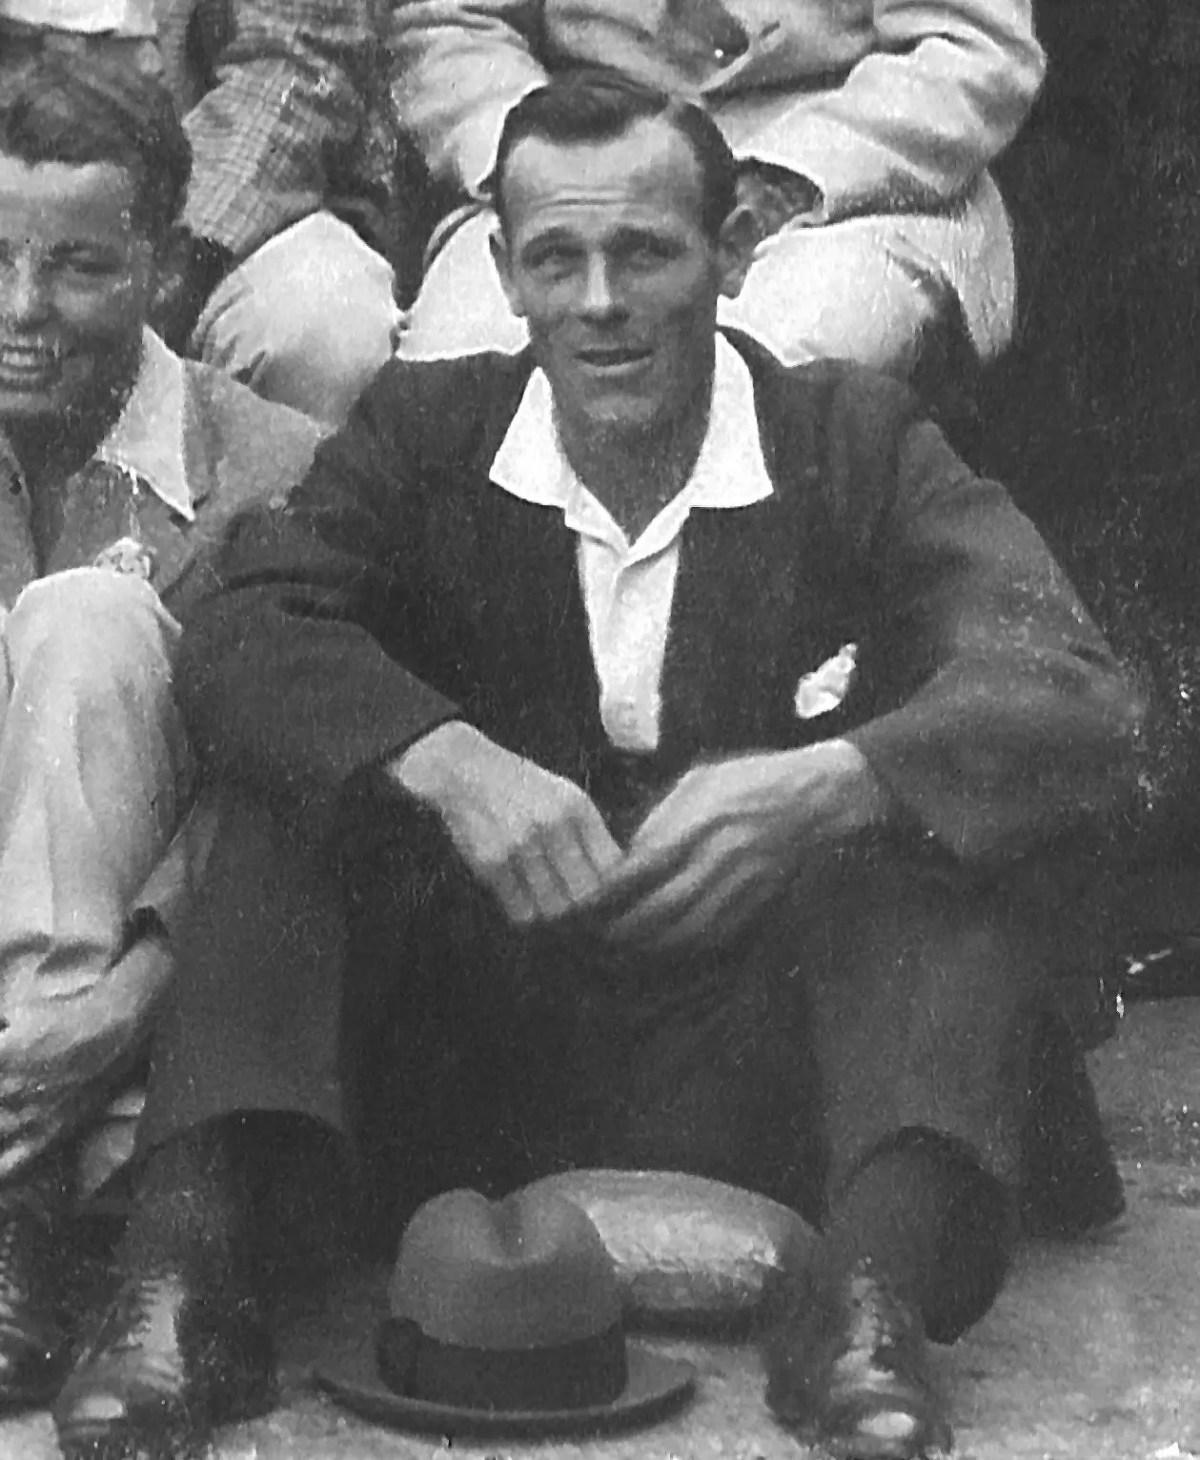 Photo of my Great-Grandfather, Frederick William Frank Davies.